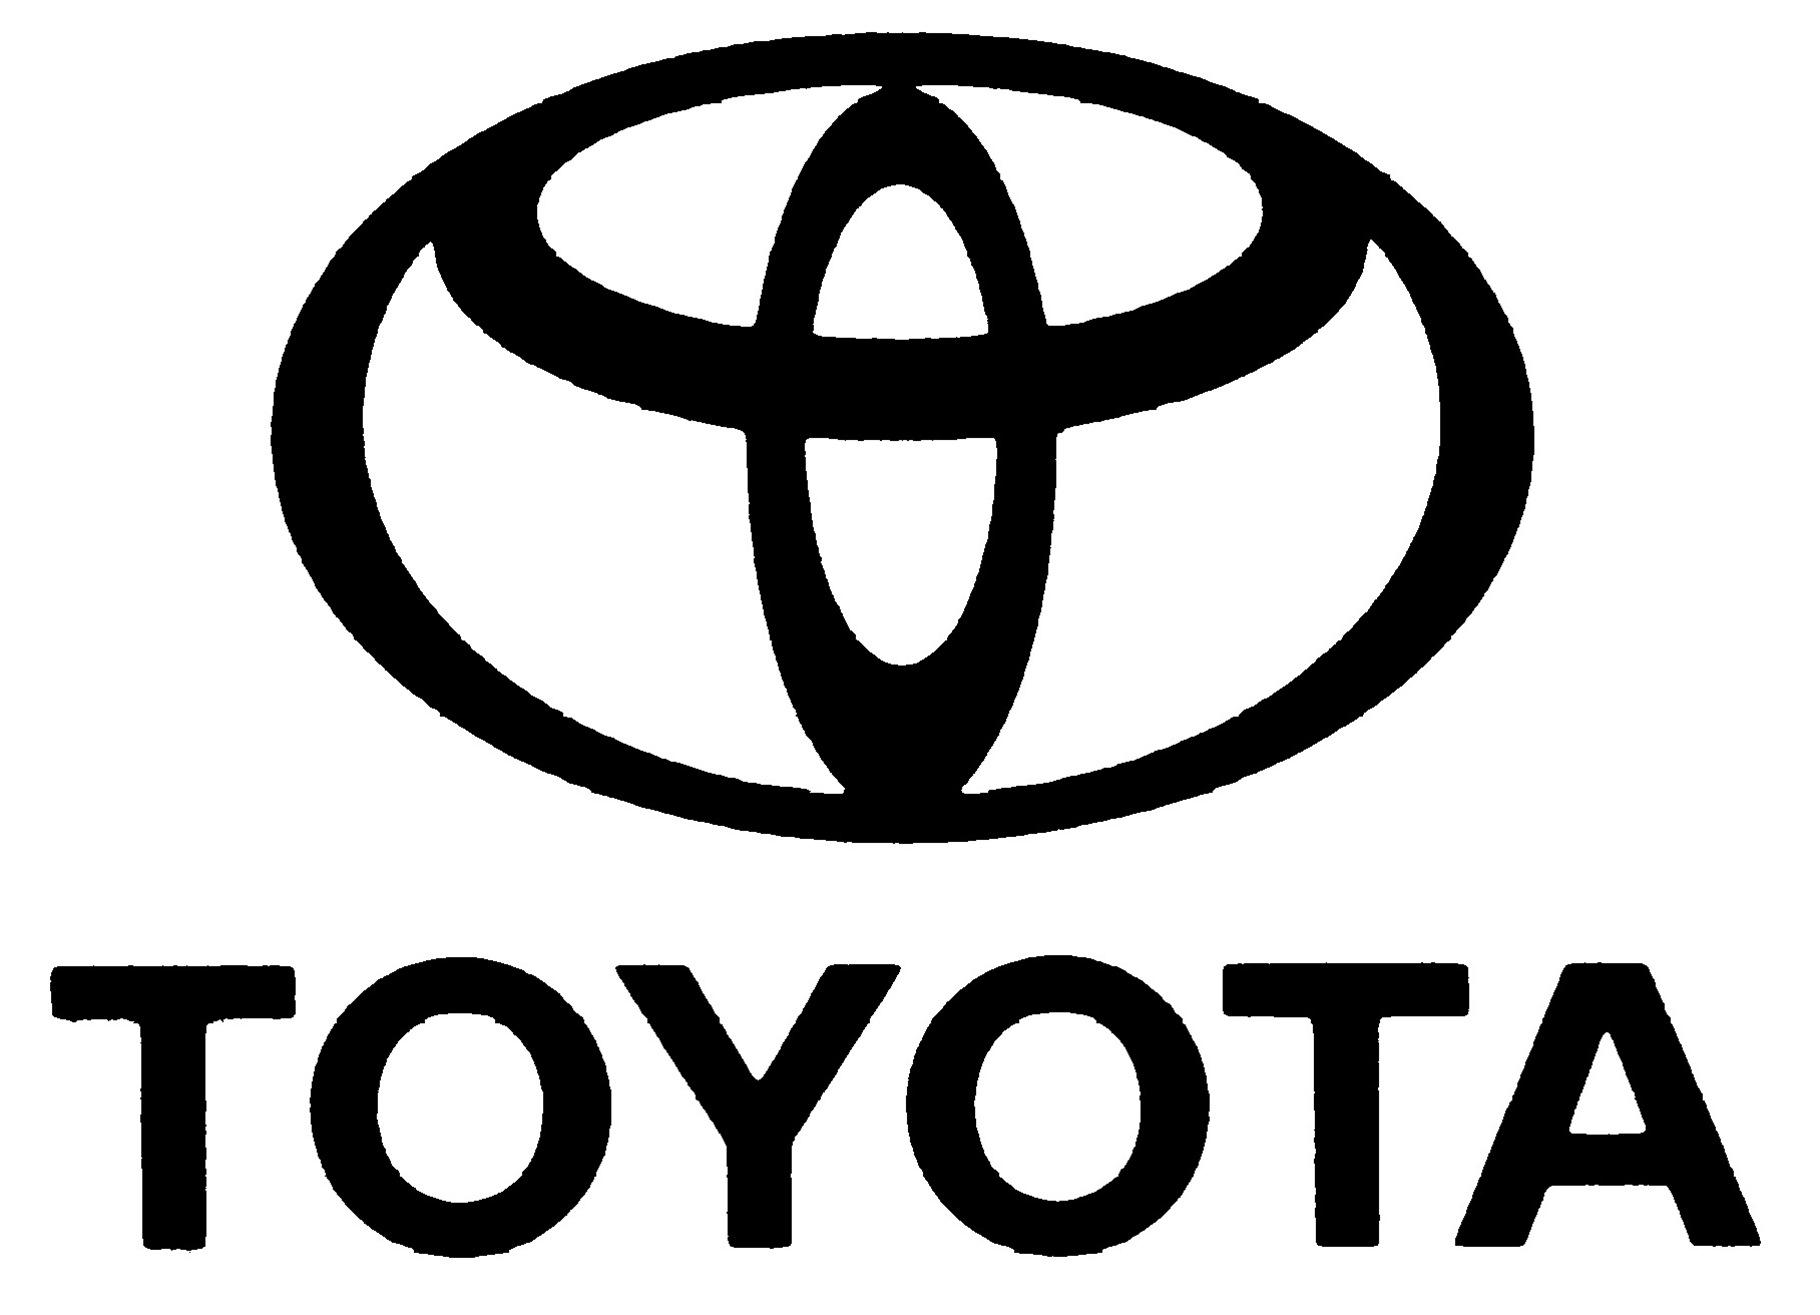 Toyota Logo Clip Art Clipart - Toyota Vector, Transparent background PNG HD thumbnail